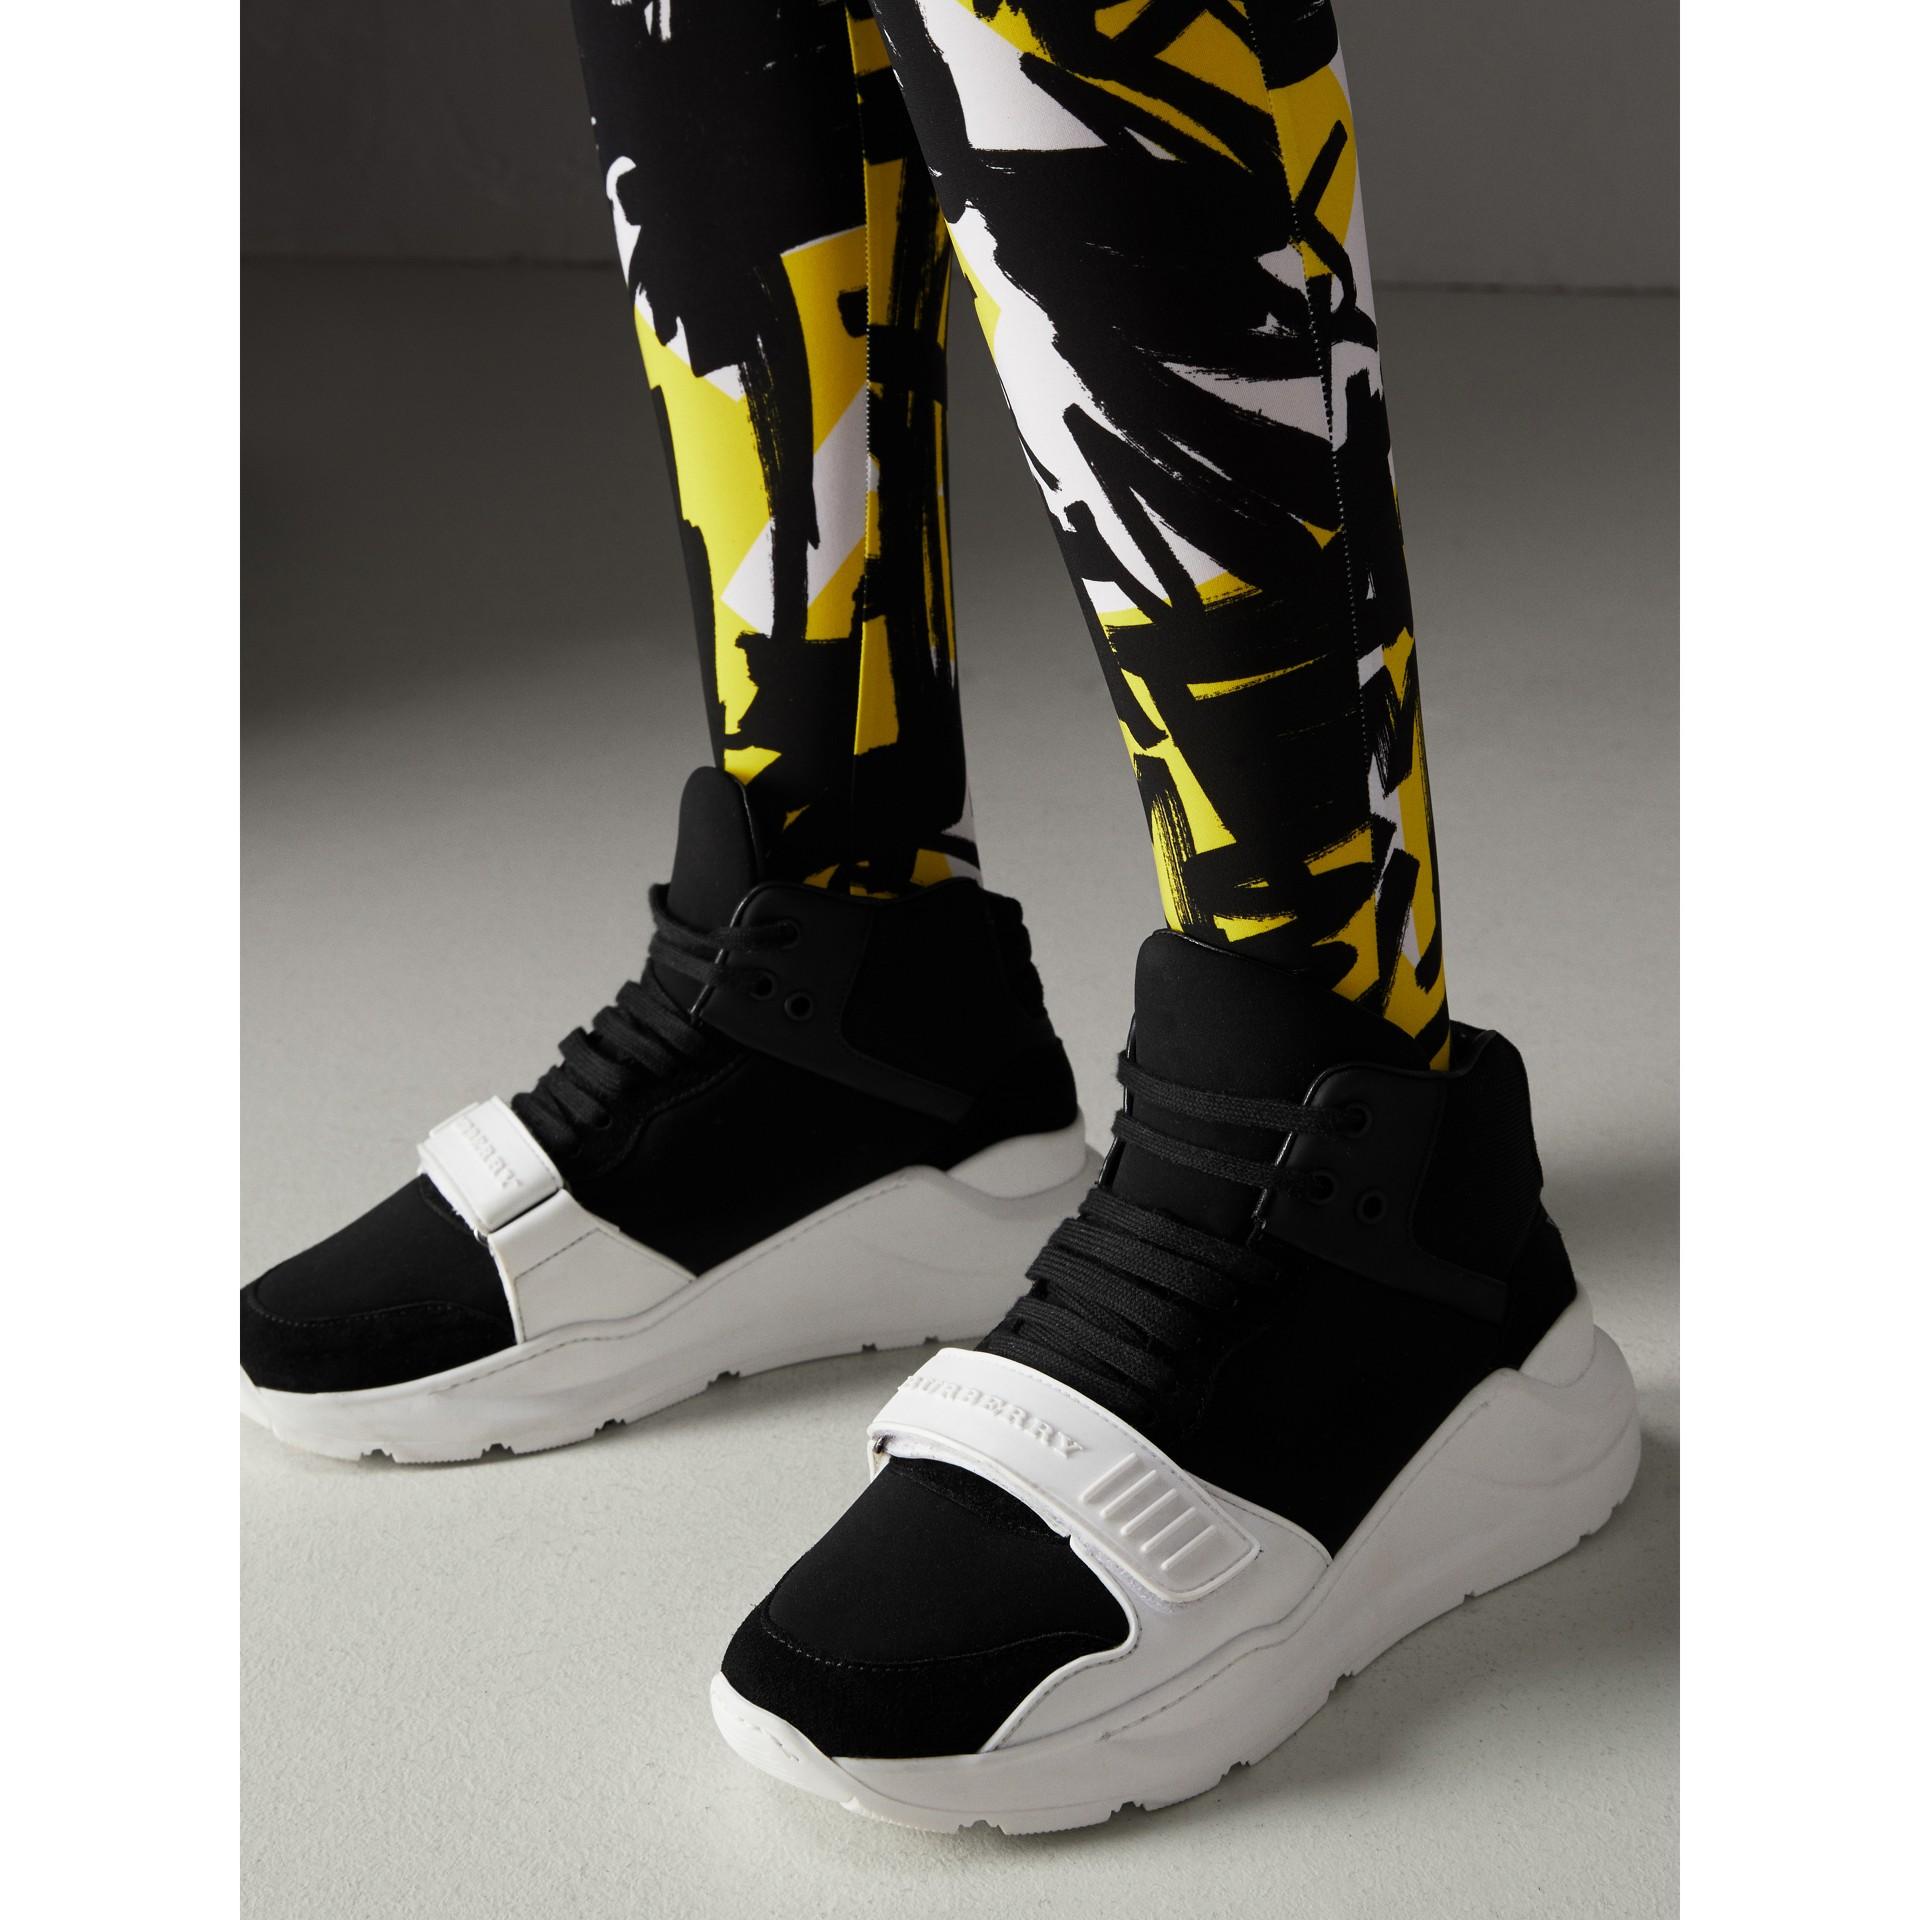 Suede and Neoprene High-top Sneakers in Black - Women | Burberry - gallery image 2